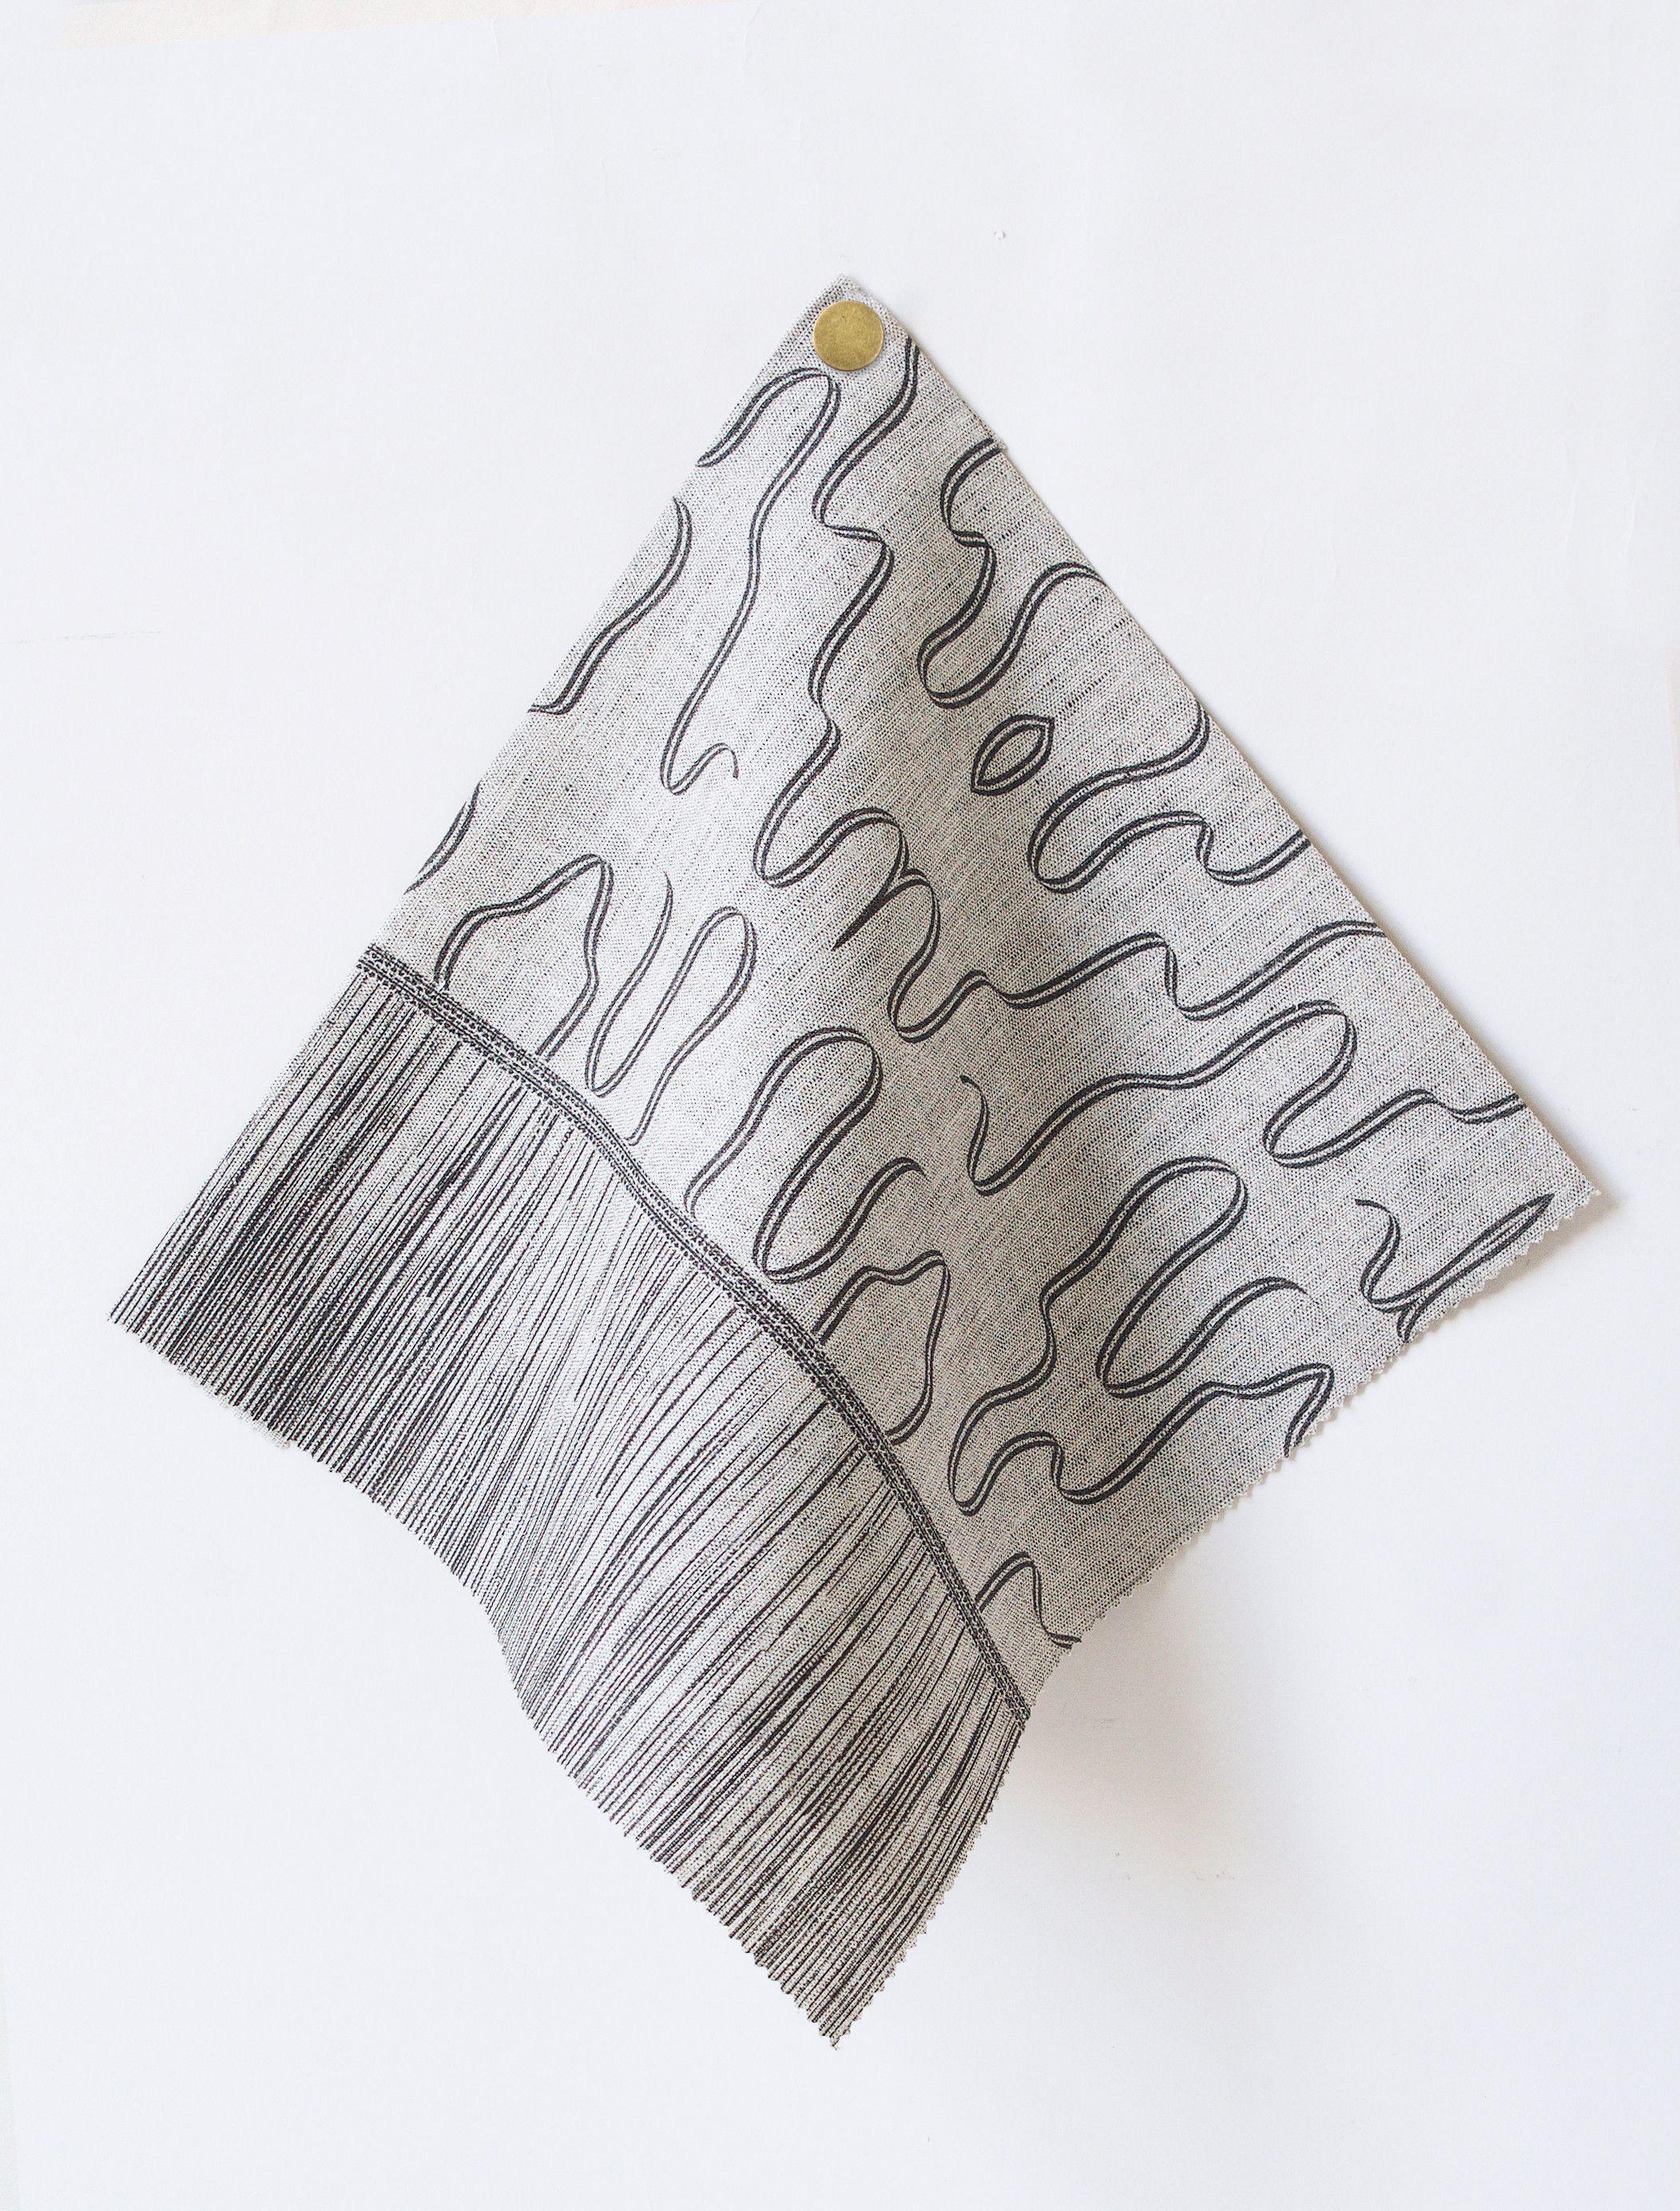 Abrayan Fabric in Kohl / Reverse